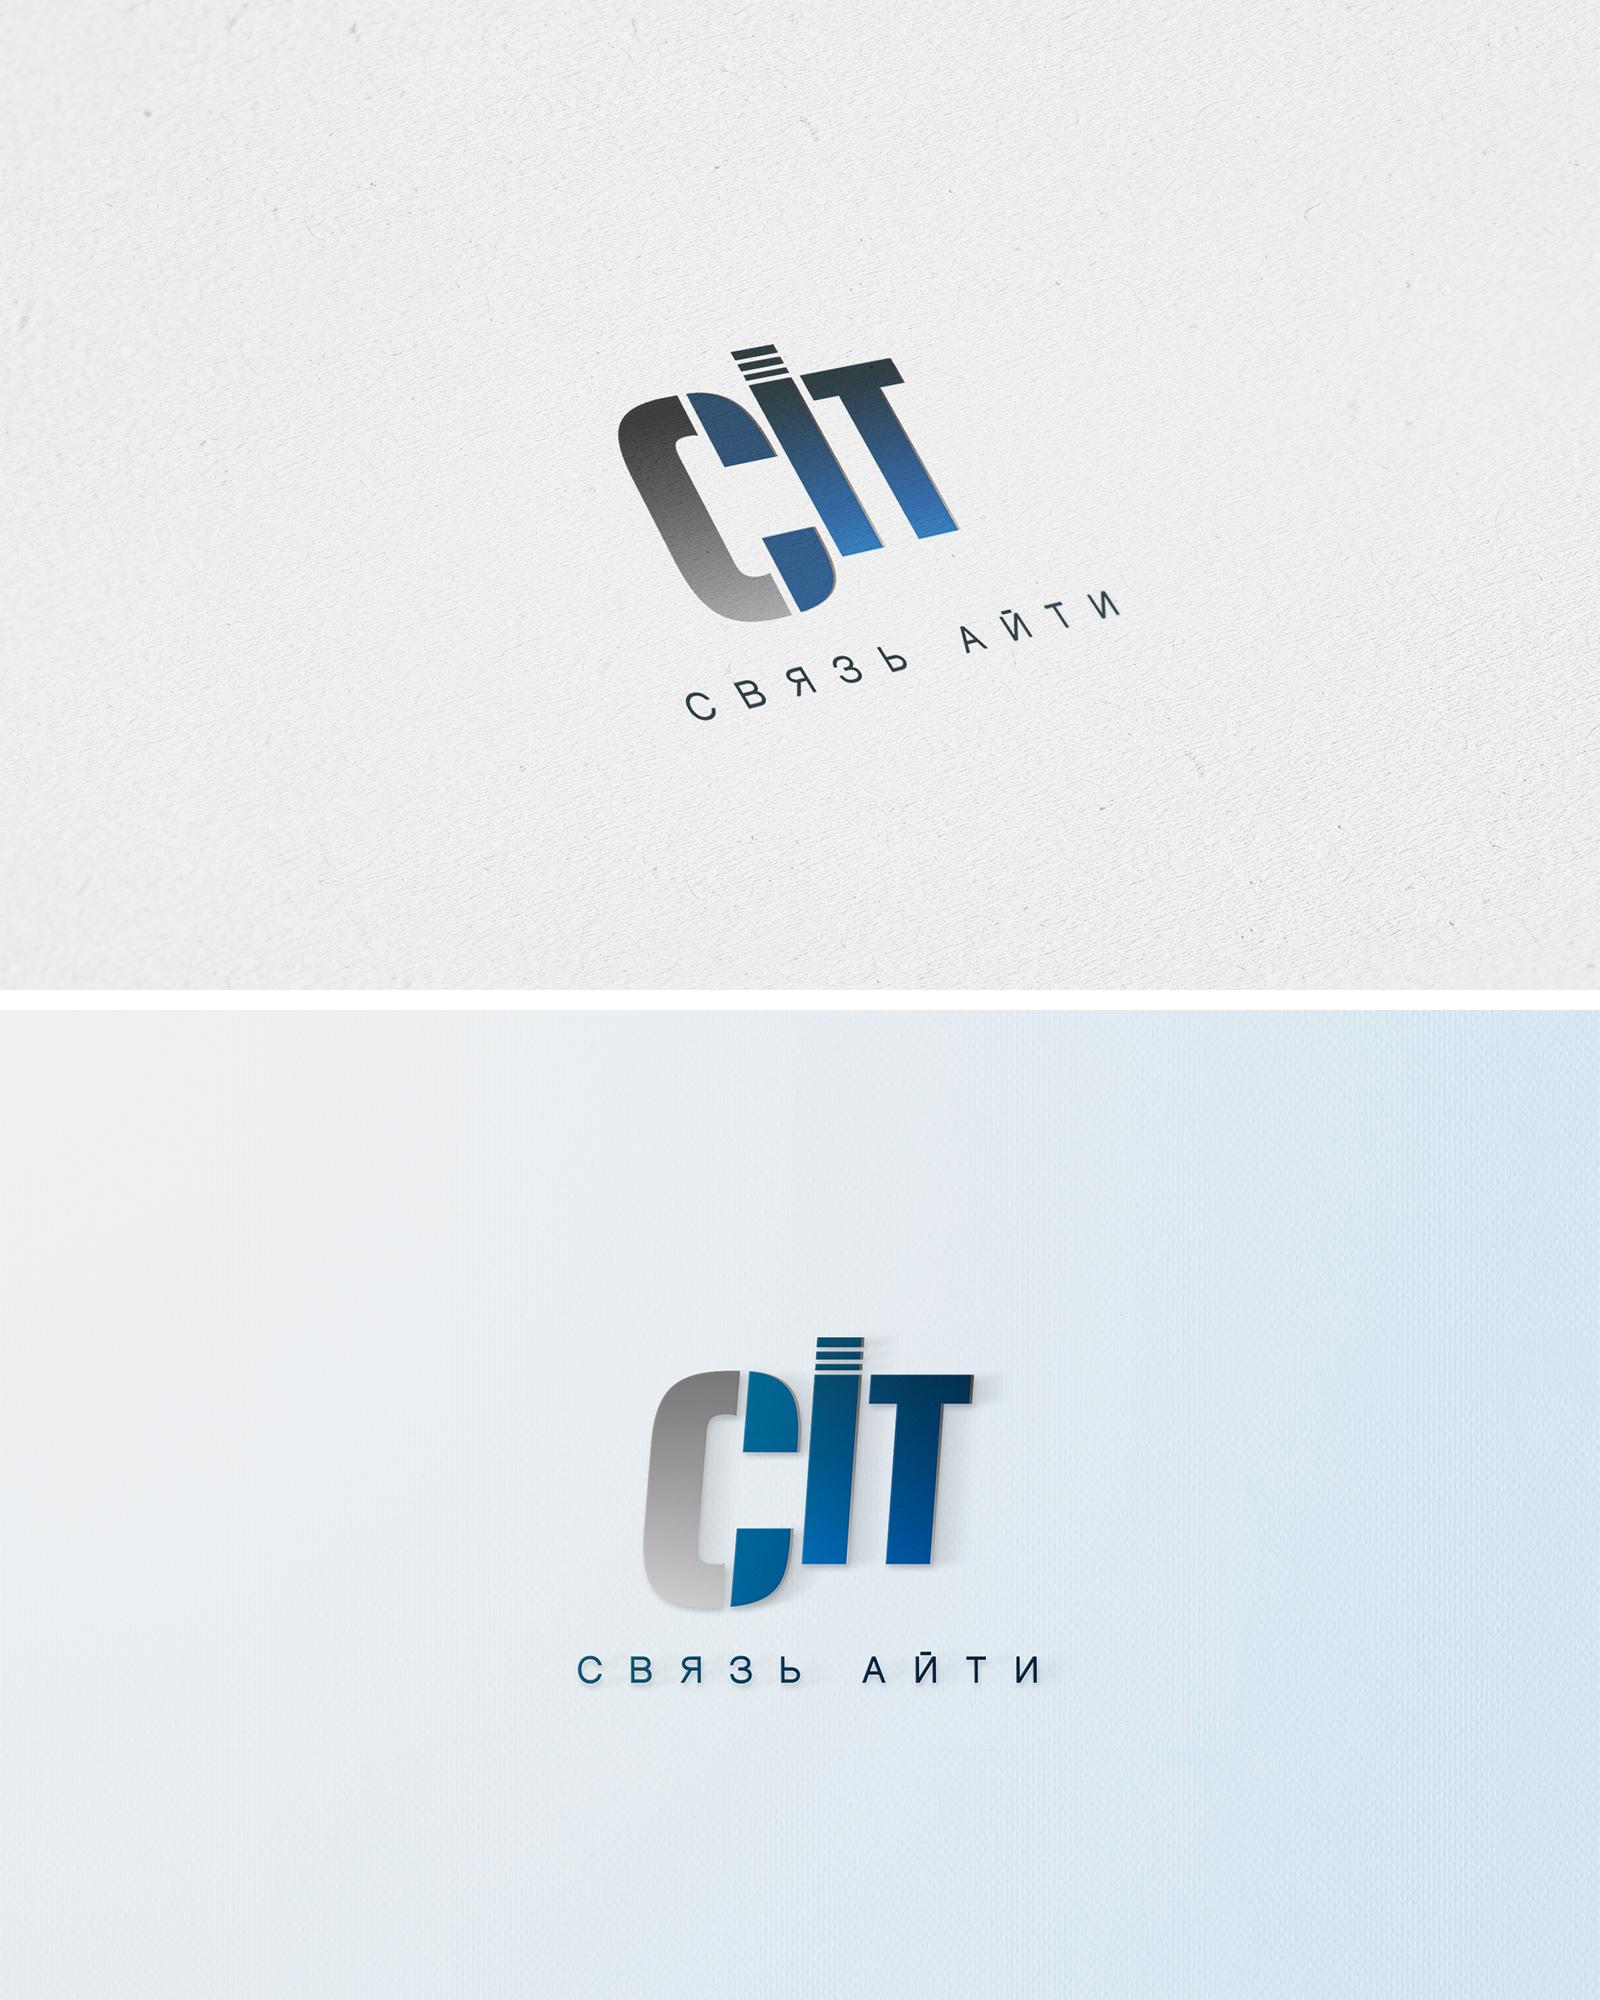 Разработка логотипа оборудования связи